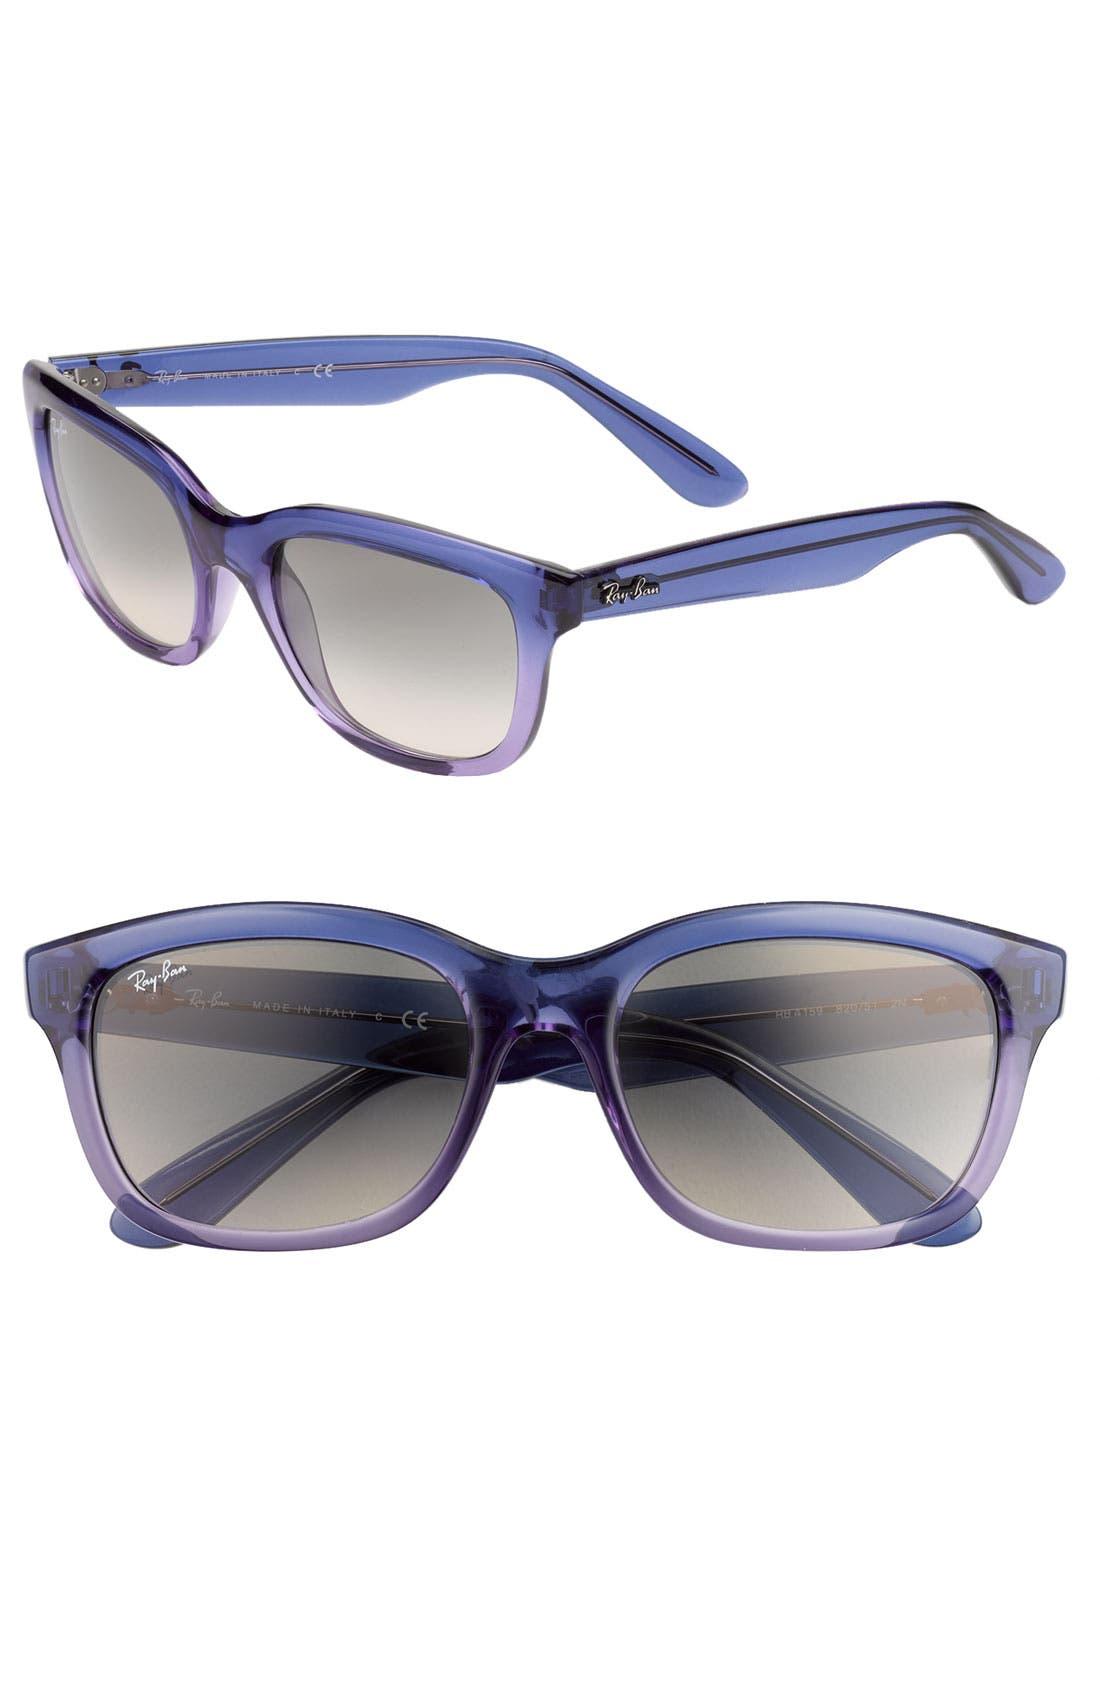 Main Image - Ray-Ban 'Updated Wayfarer' 54mm Sunglasses